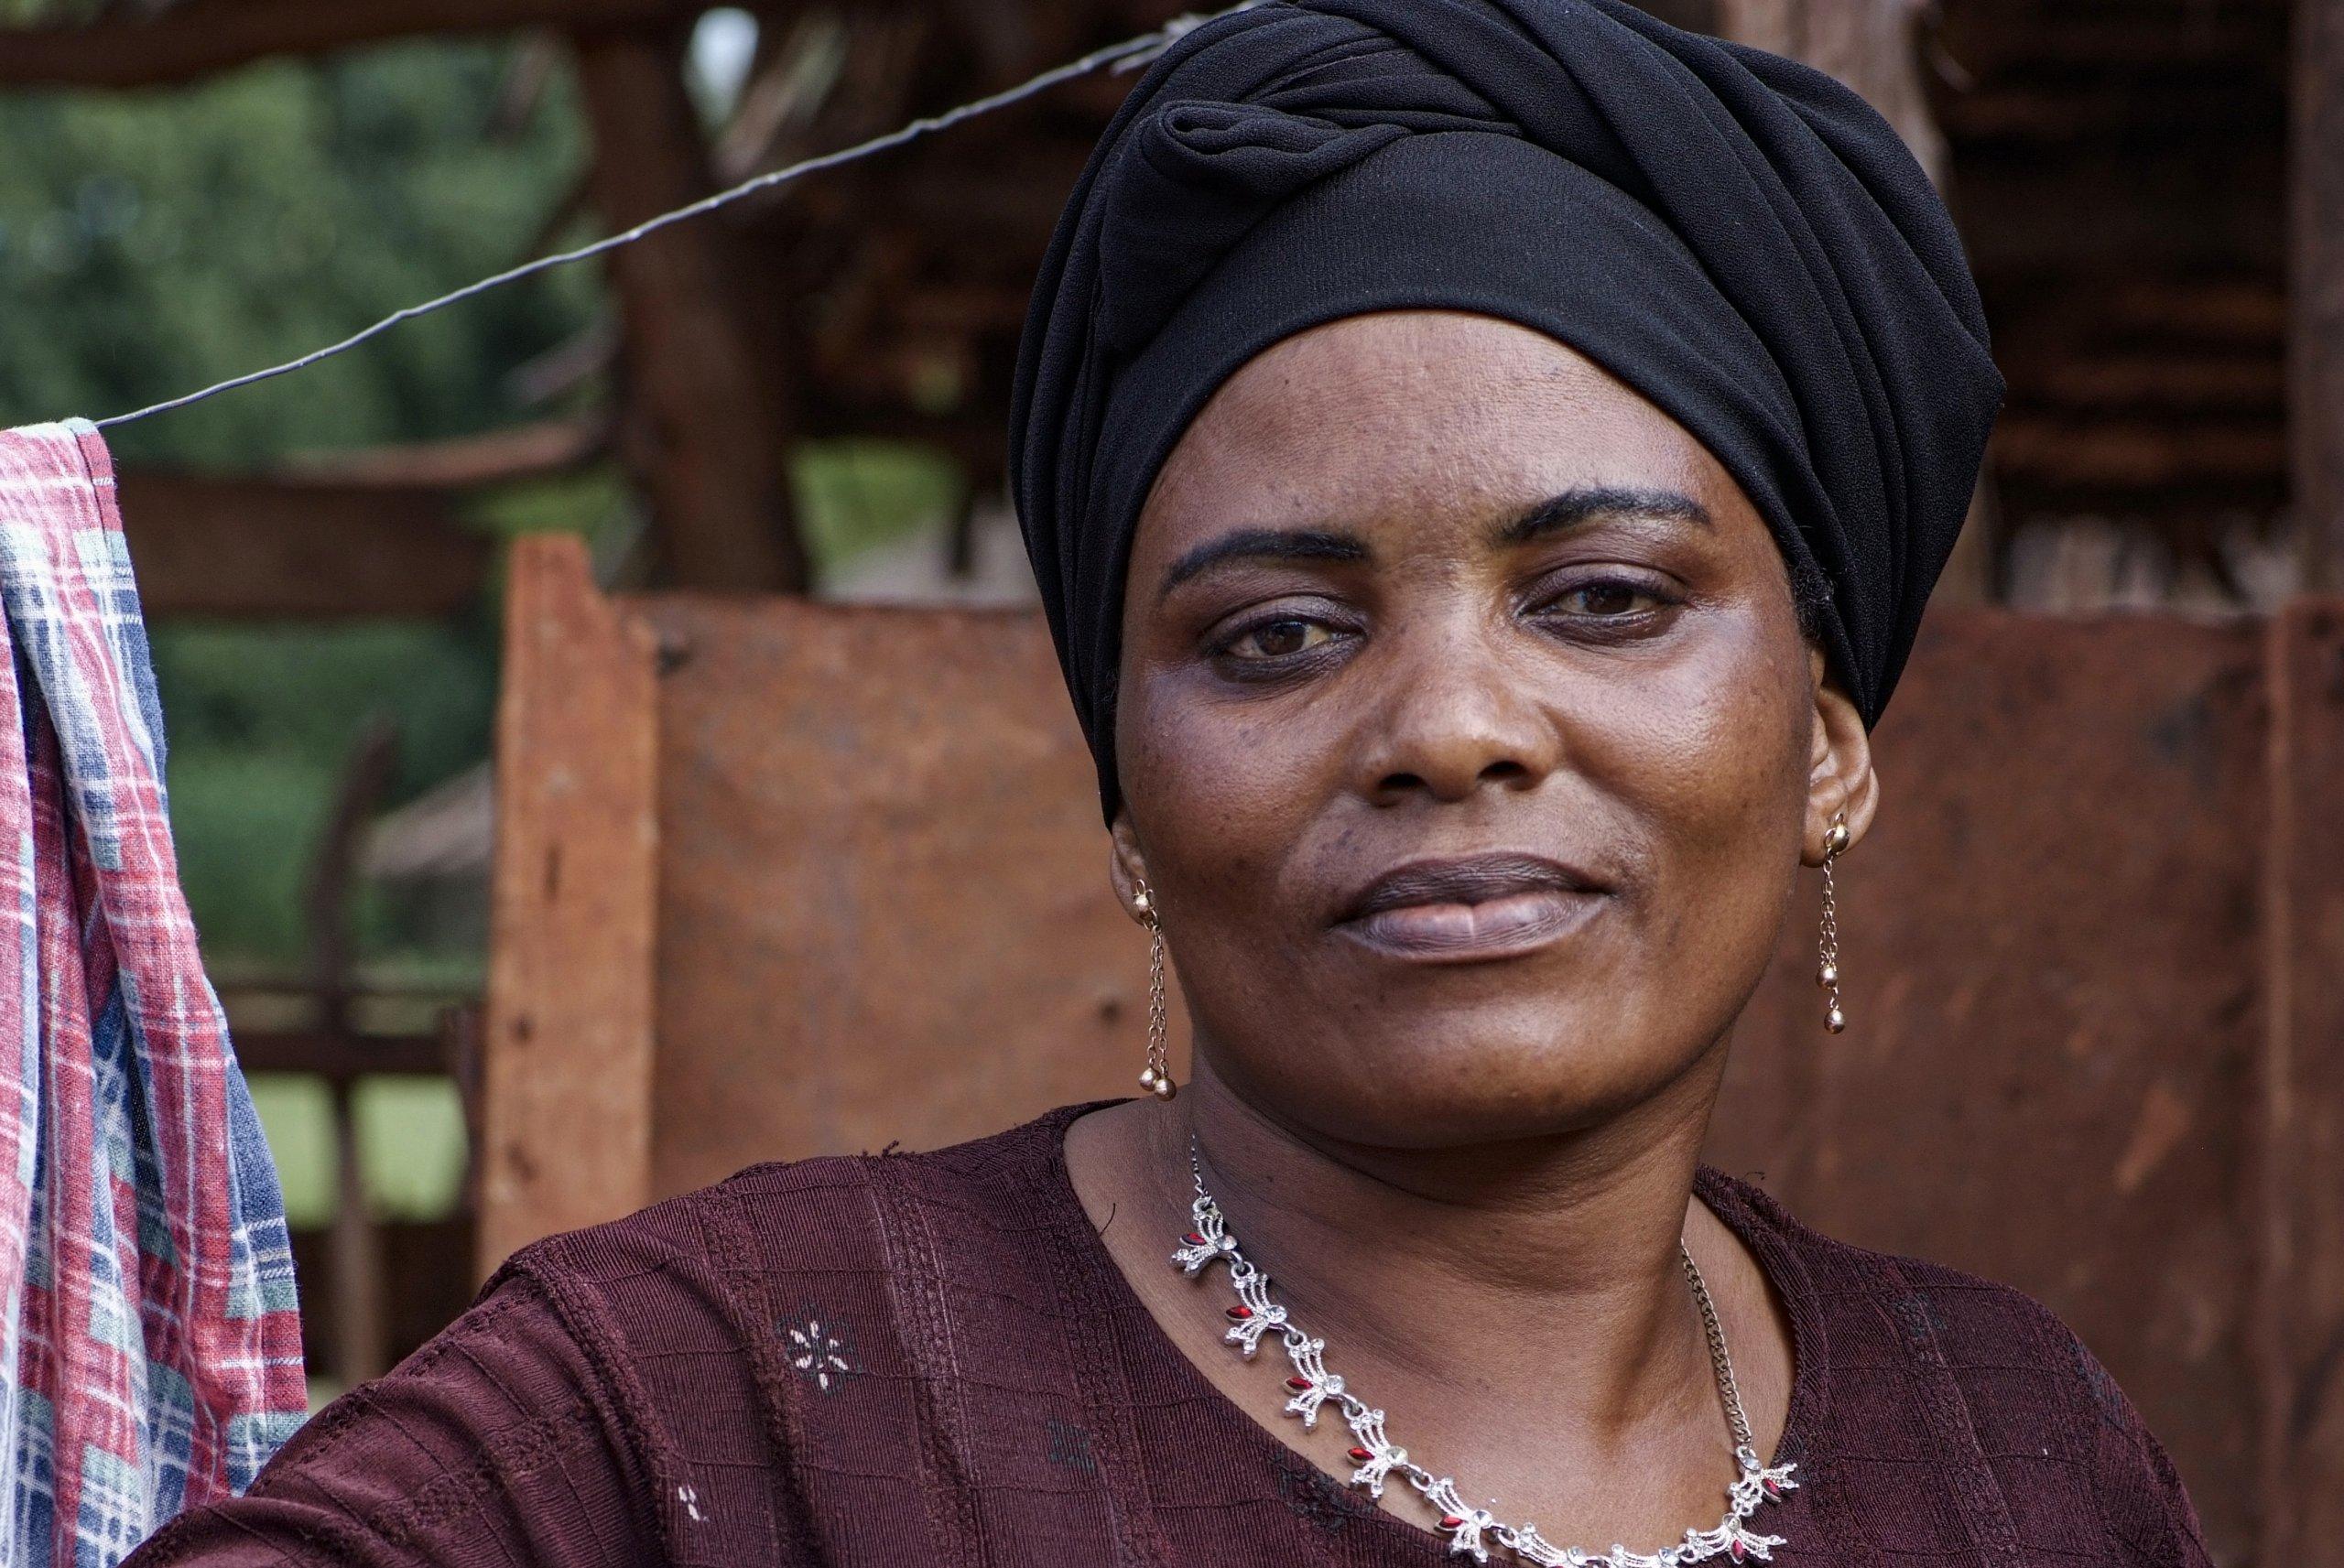 38 05 boerin trotsevrouw Mwajuma Abdalah Maramba Tanzania 6212 scaled